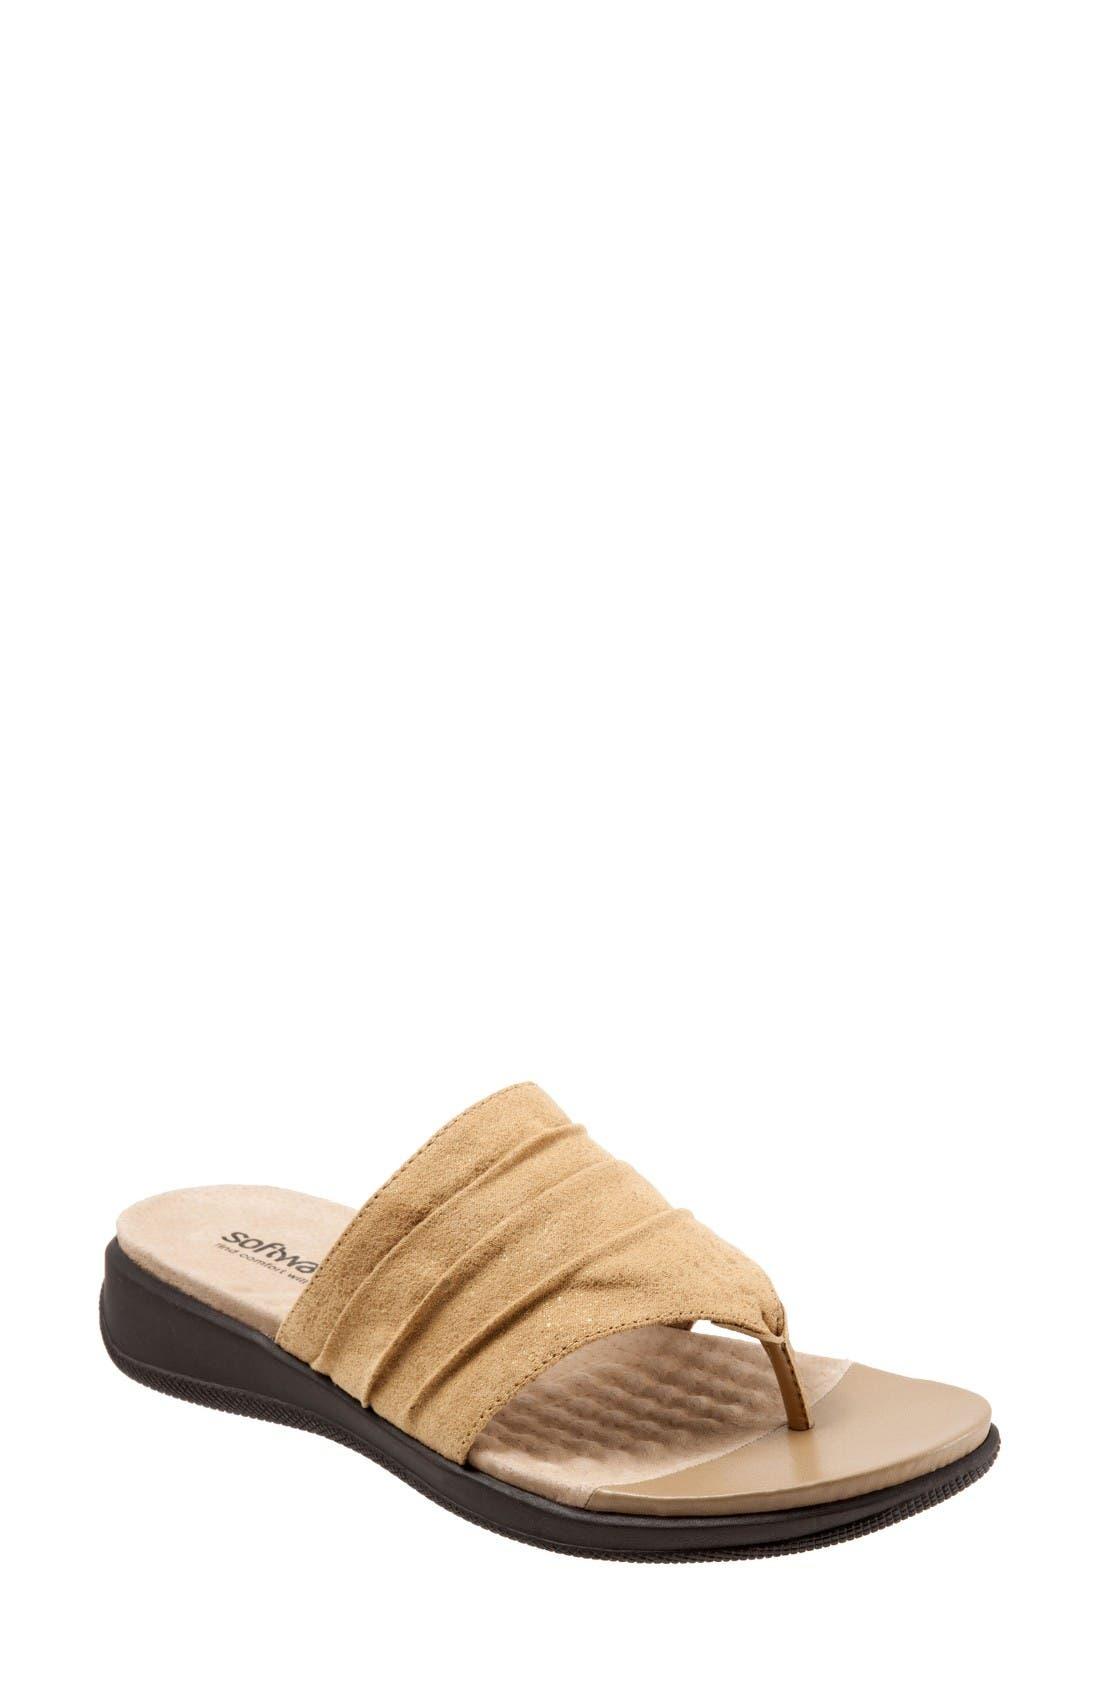 Alternate Image 1 Selected - SoftWalk® 'Toma' Thong Sandal (Women)